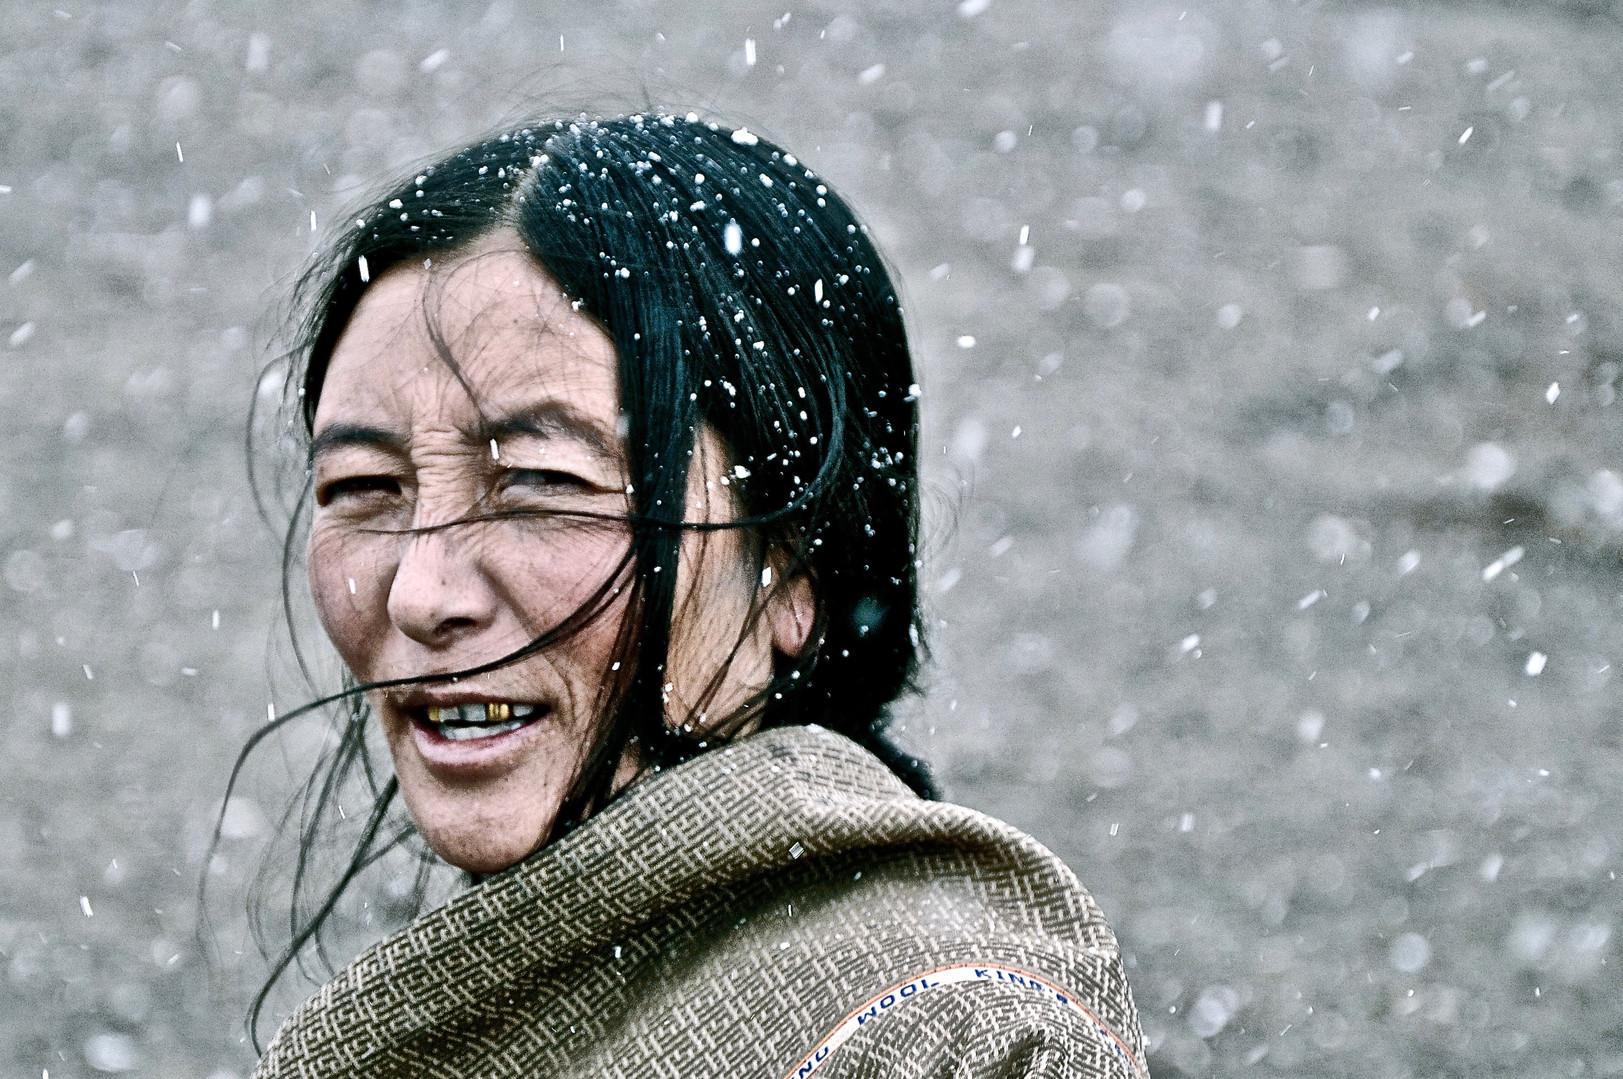 Snowborne Fire - The Matriarch - Amne Machin - Qinghai